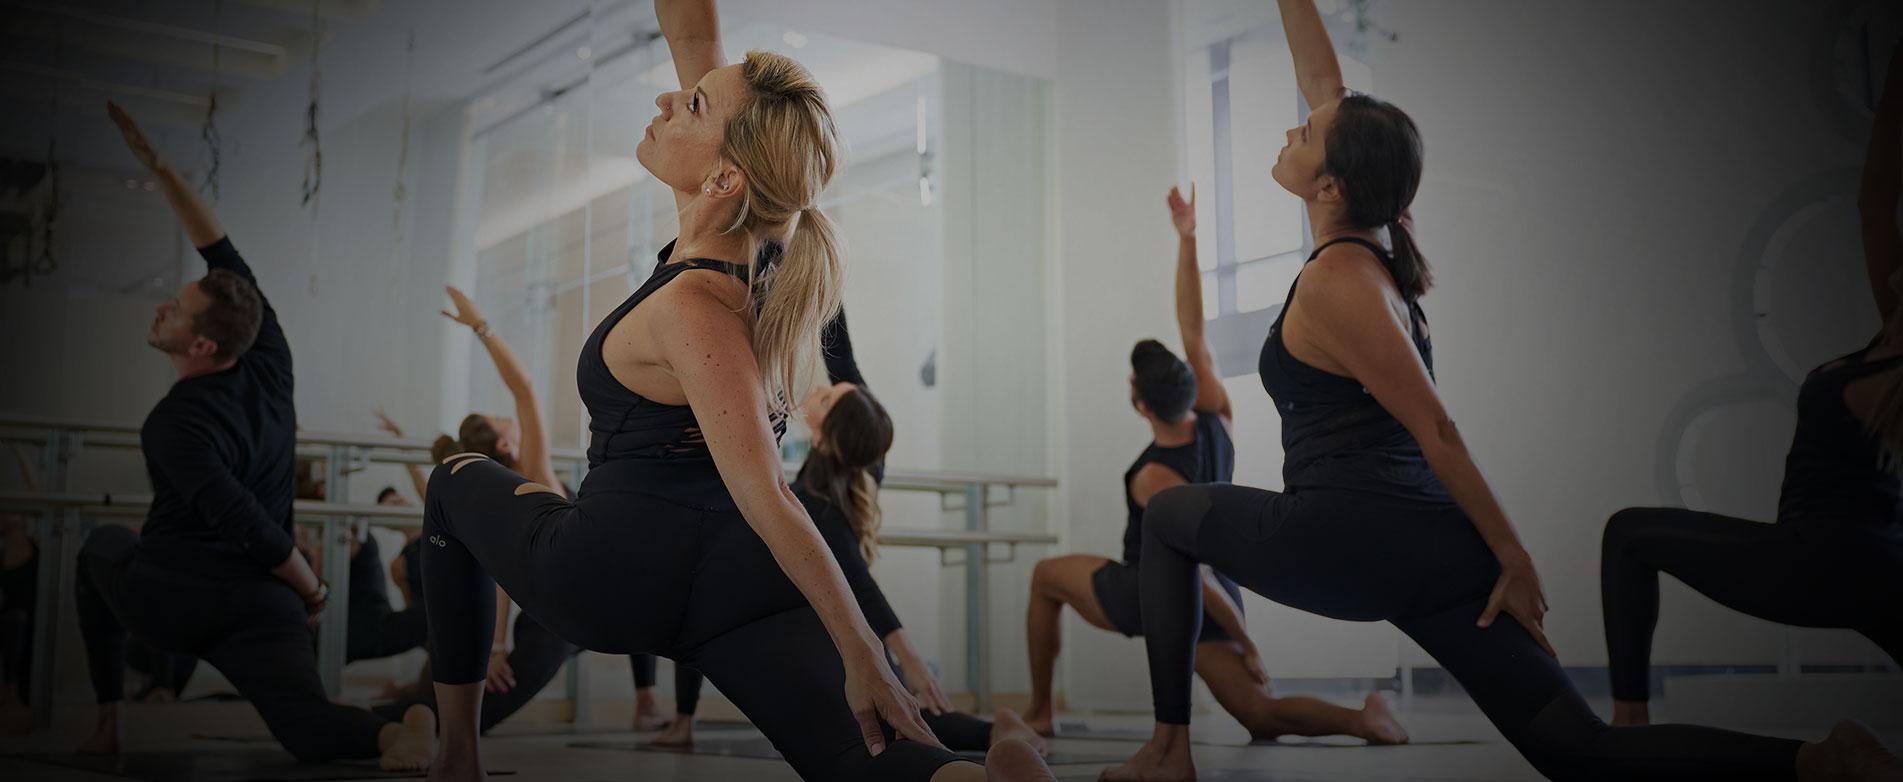 Join with Yogalaviedubai